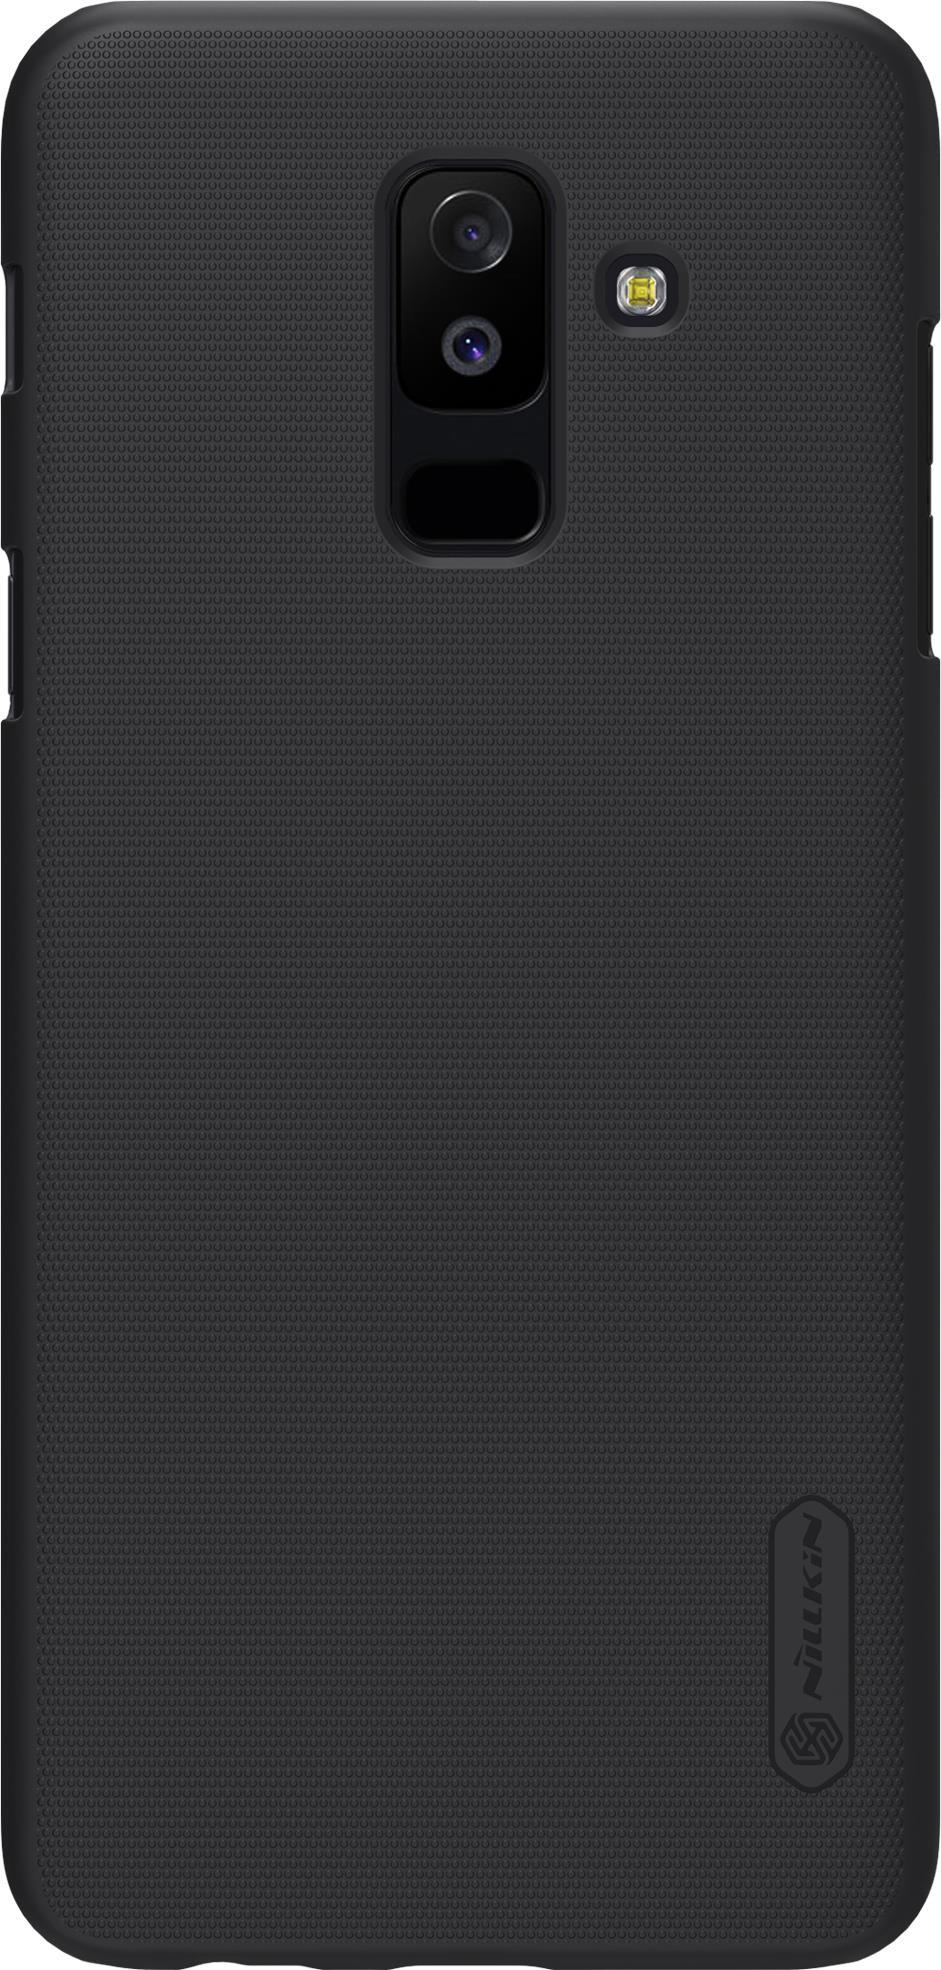 Накладка Nillkin Super Frosted для Galaxy A6+, 6902048157835, черный